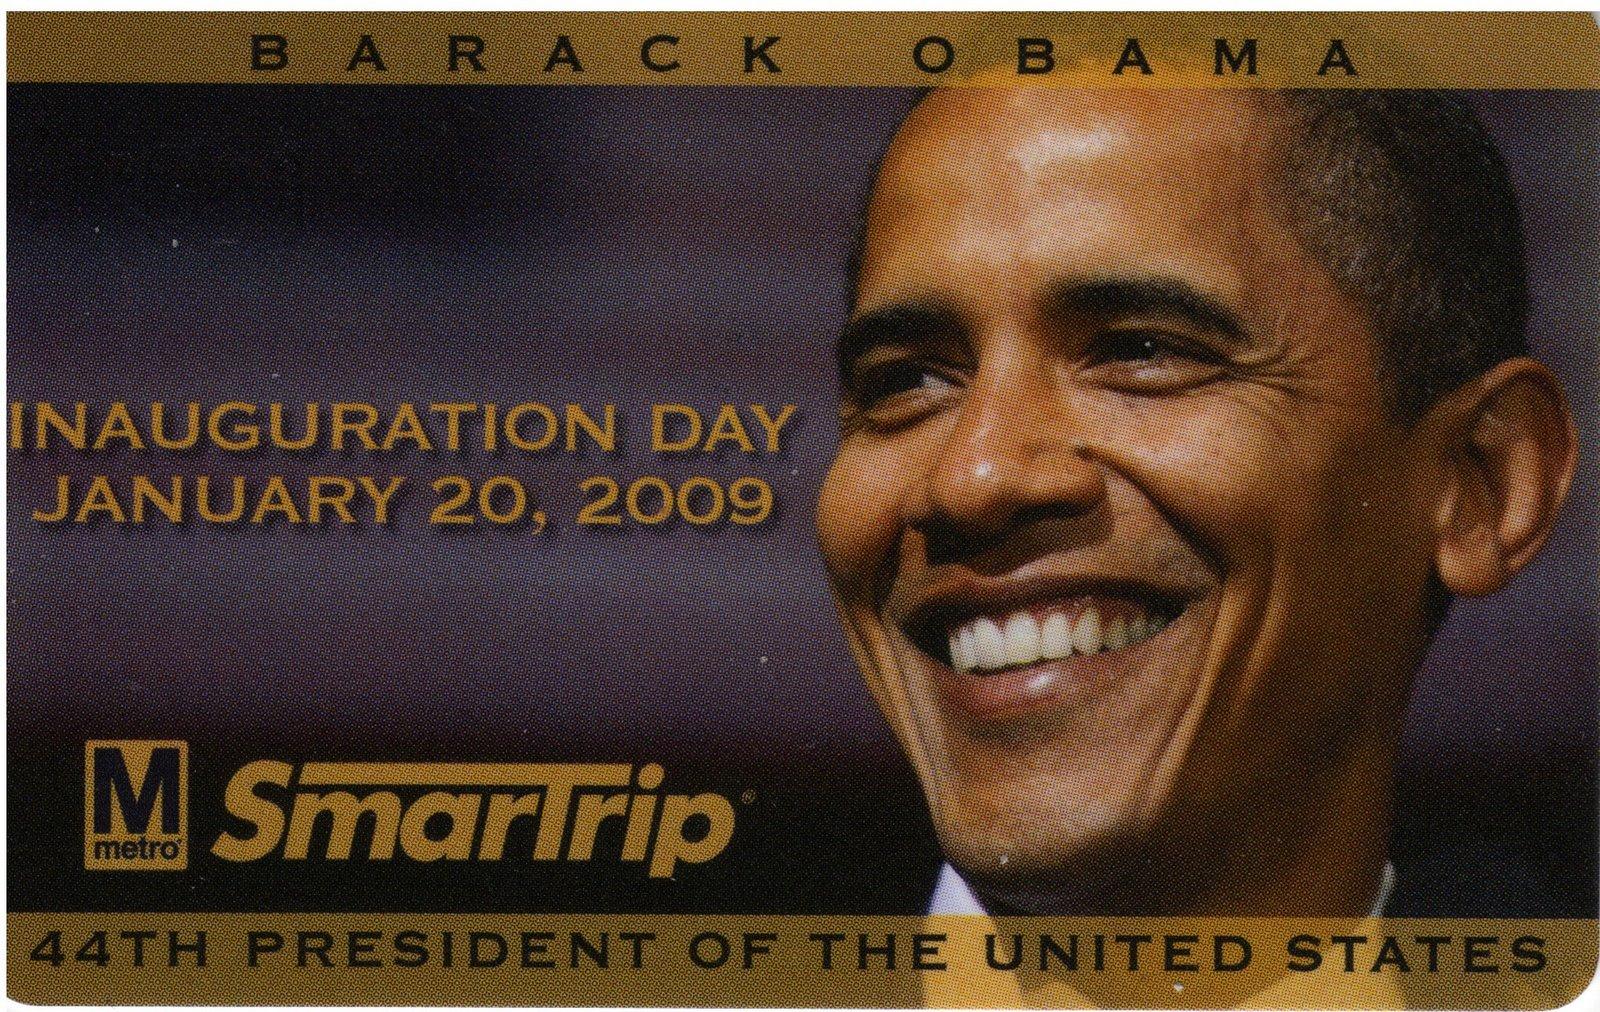 [ObamaFarecard]